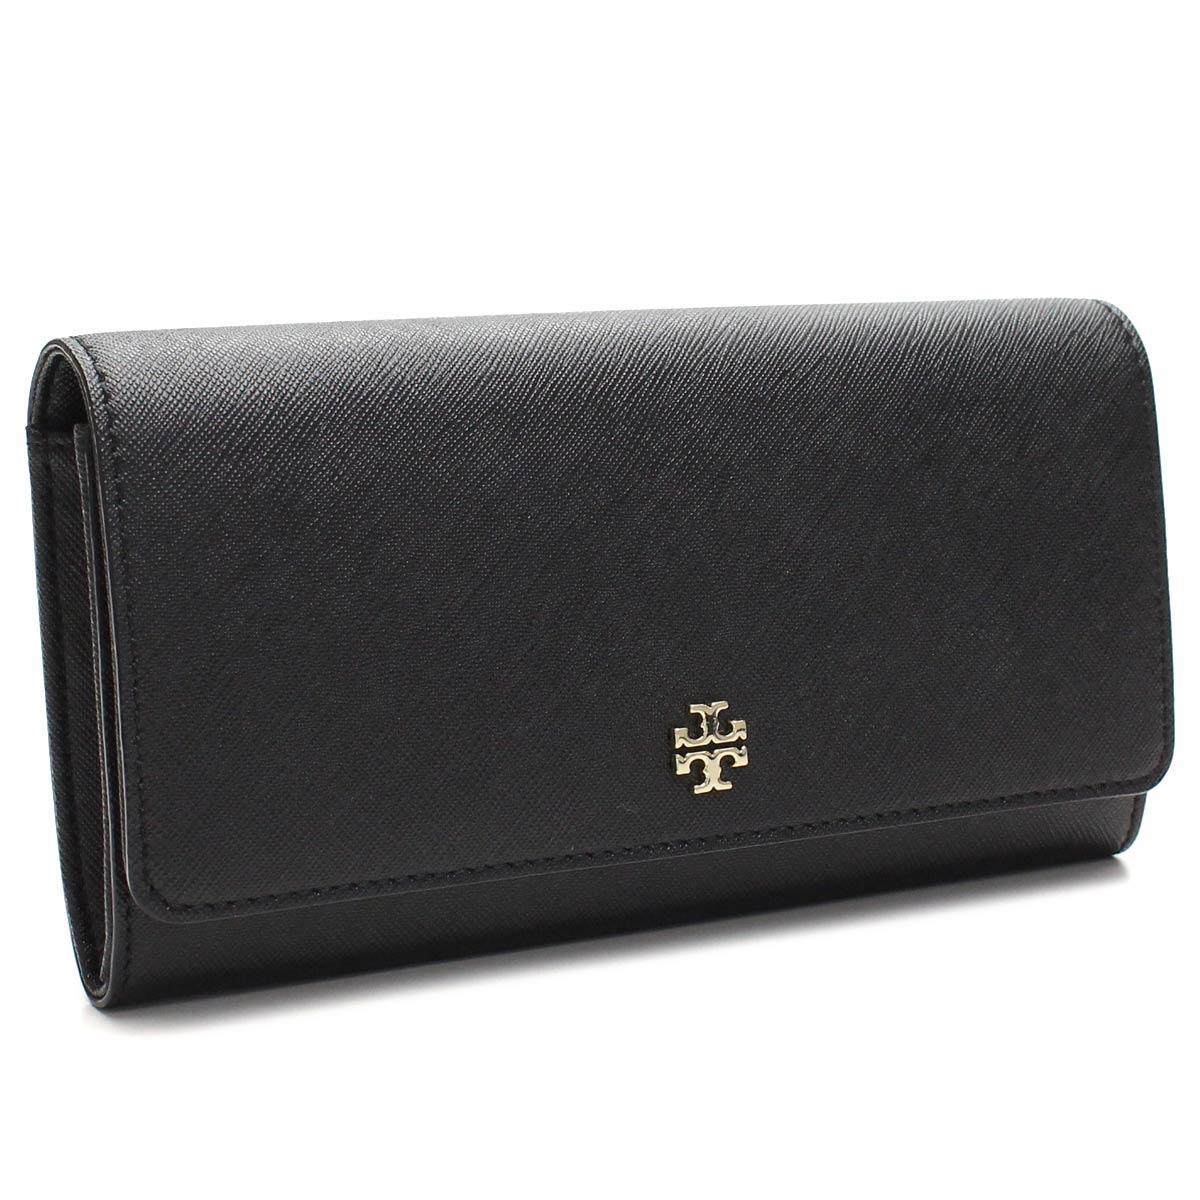 4de5439fa7d6 Bighit The total brand wholesale  Tory Burch (TORY BURCH) ROBINSON ENVELOPE  CONTINENTAL wallet two fold rubx 11169072-001 BLACK black wallet(  taxfree send ...